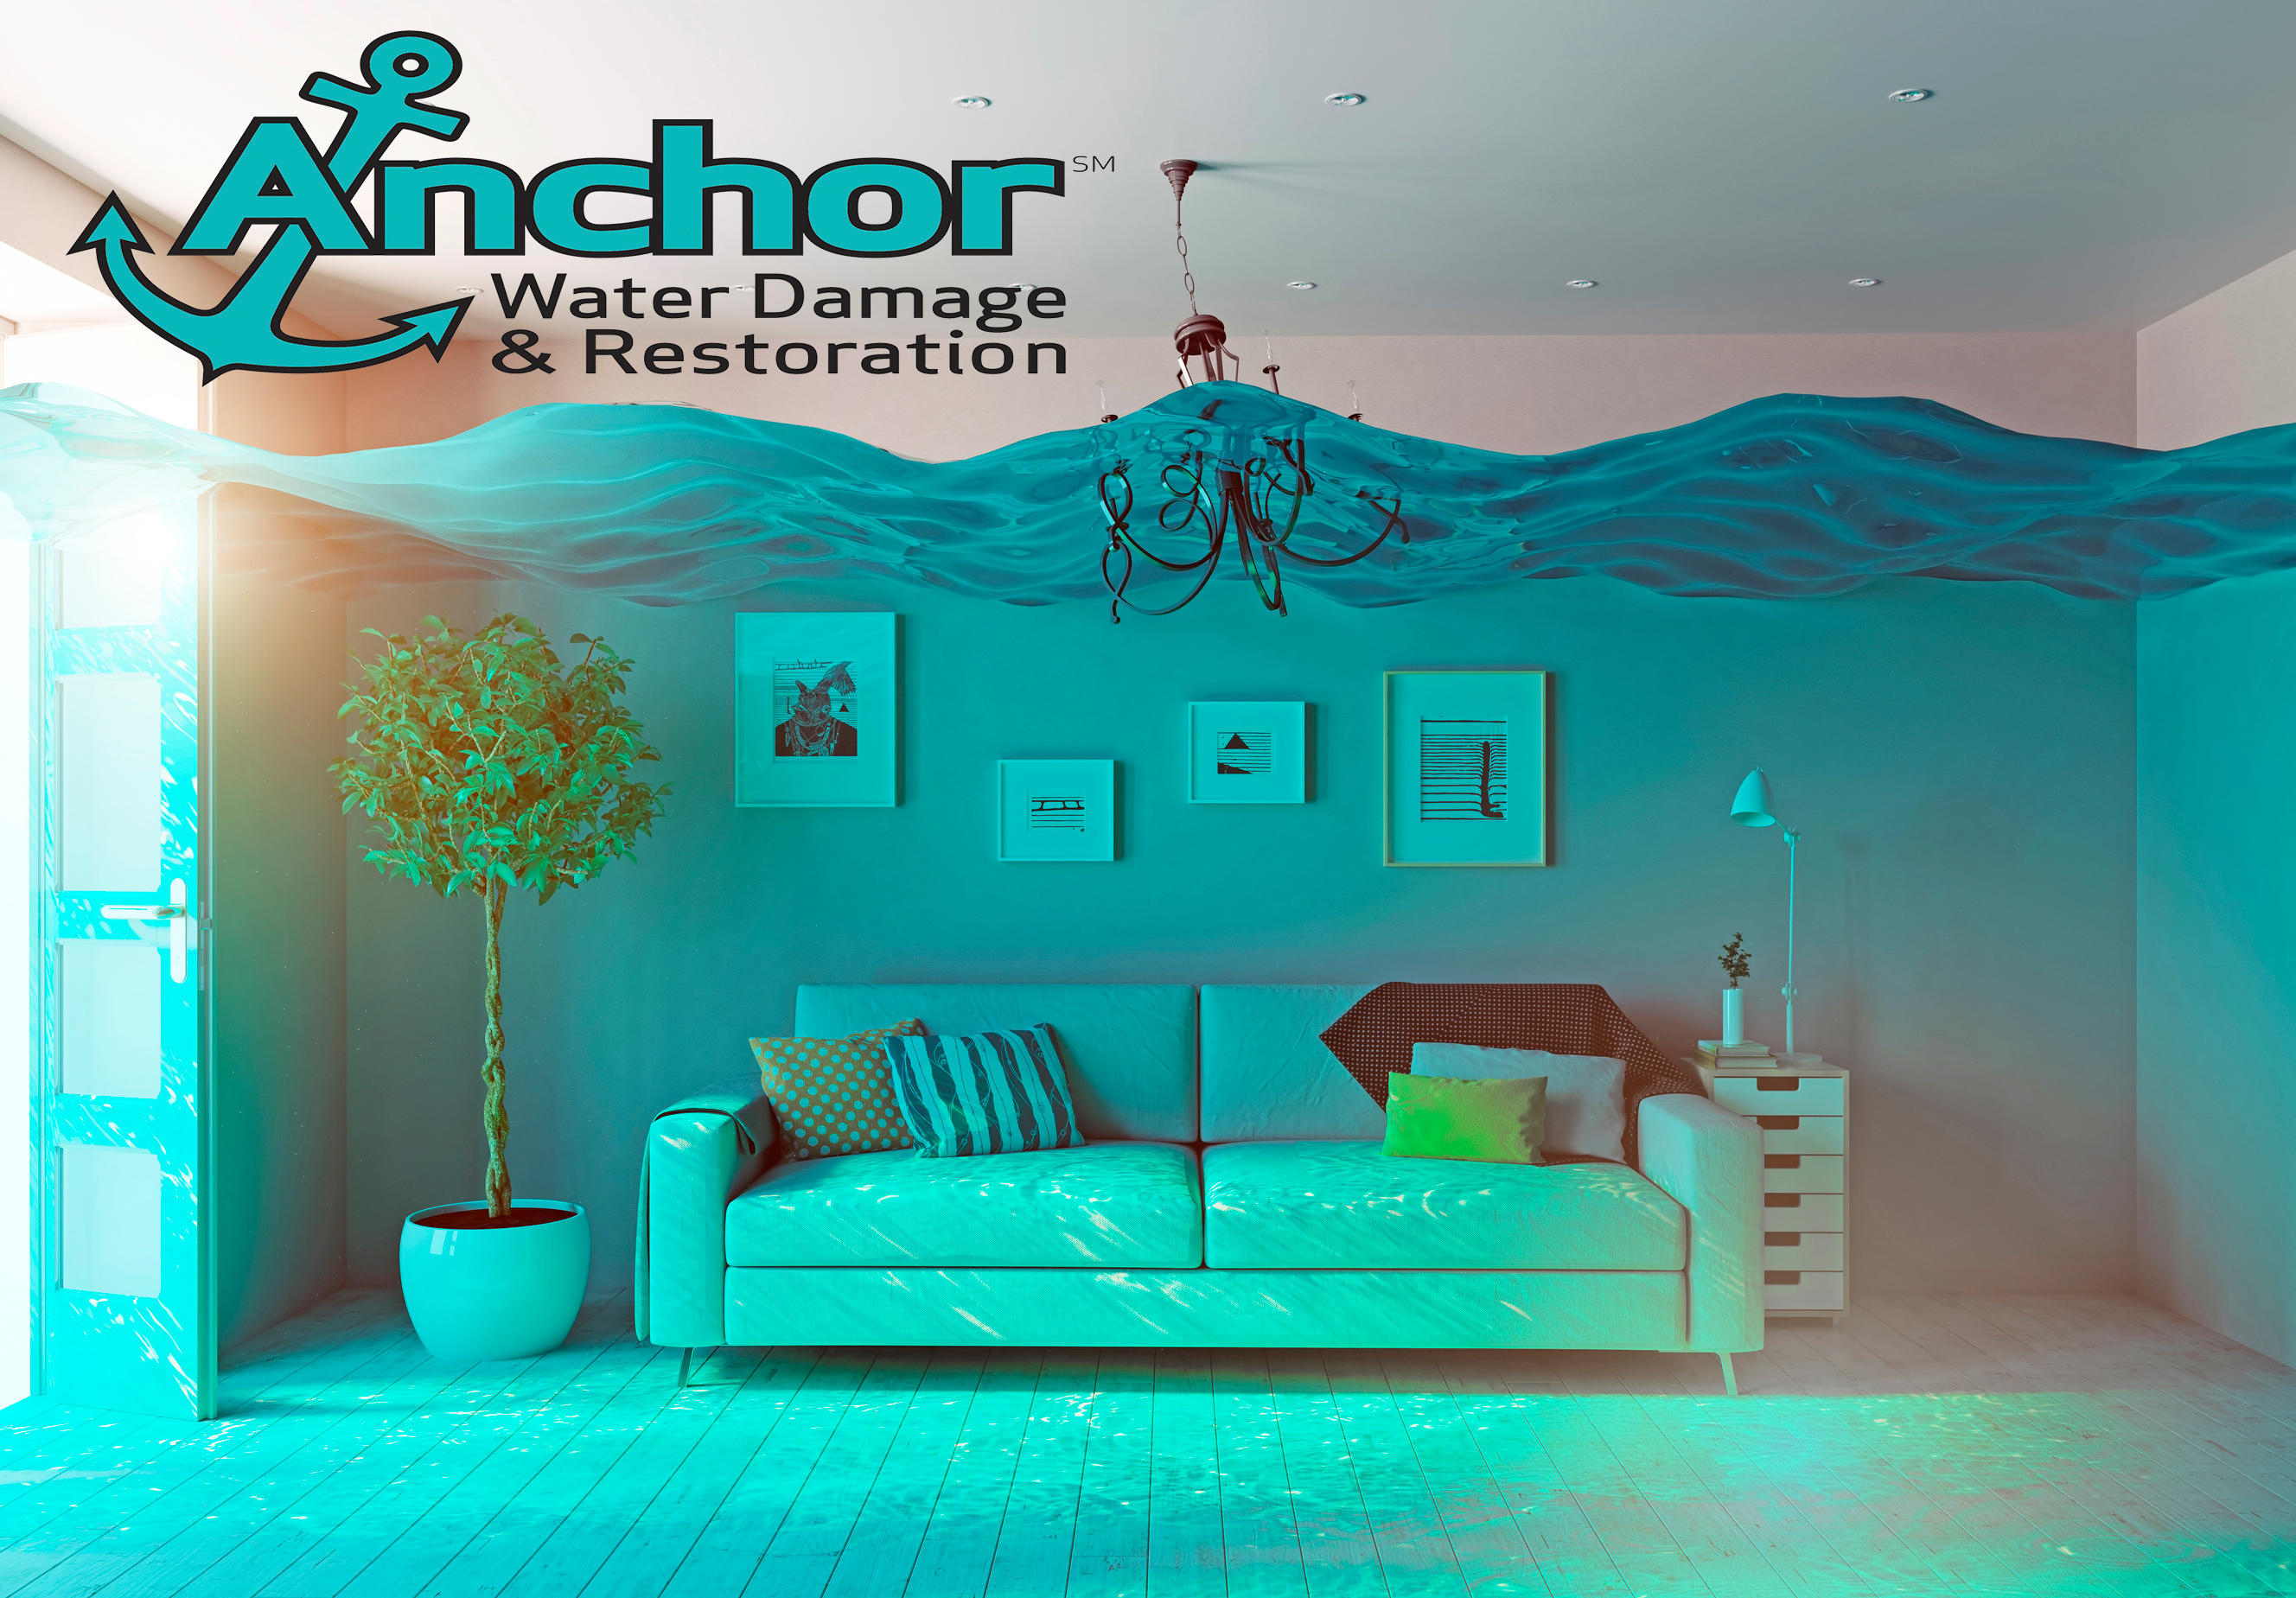 Anchor Water Damage & Restoration image 3